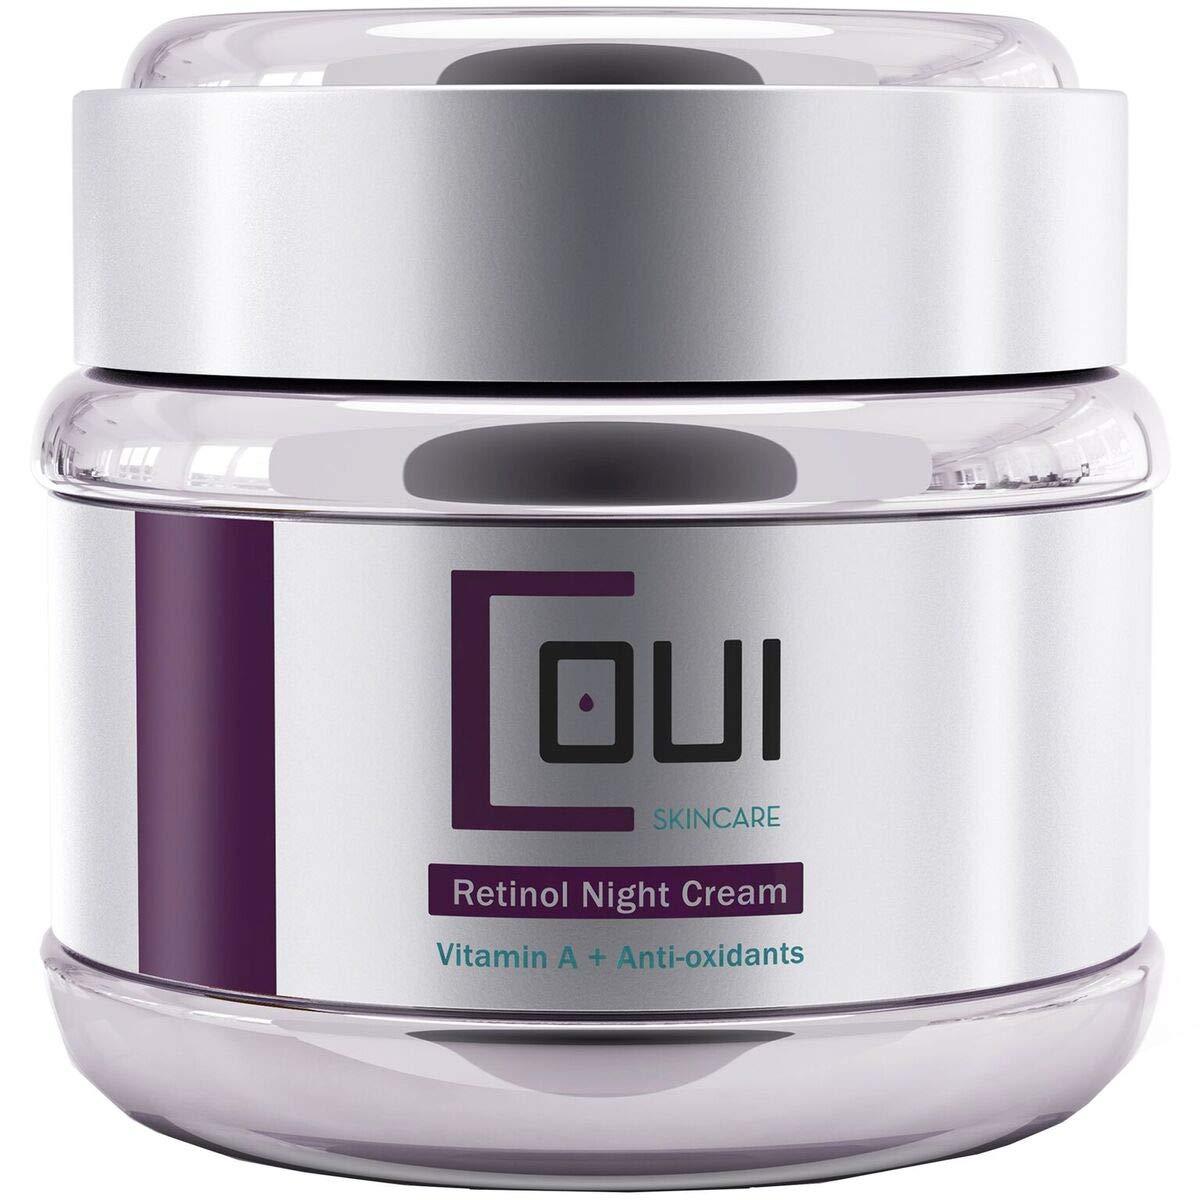 RETINOL Night Cream Face National products Moisturizer Par Wrinkle Anti Award-winning store Aging